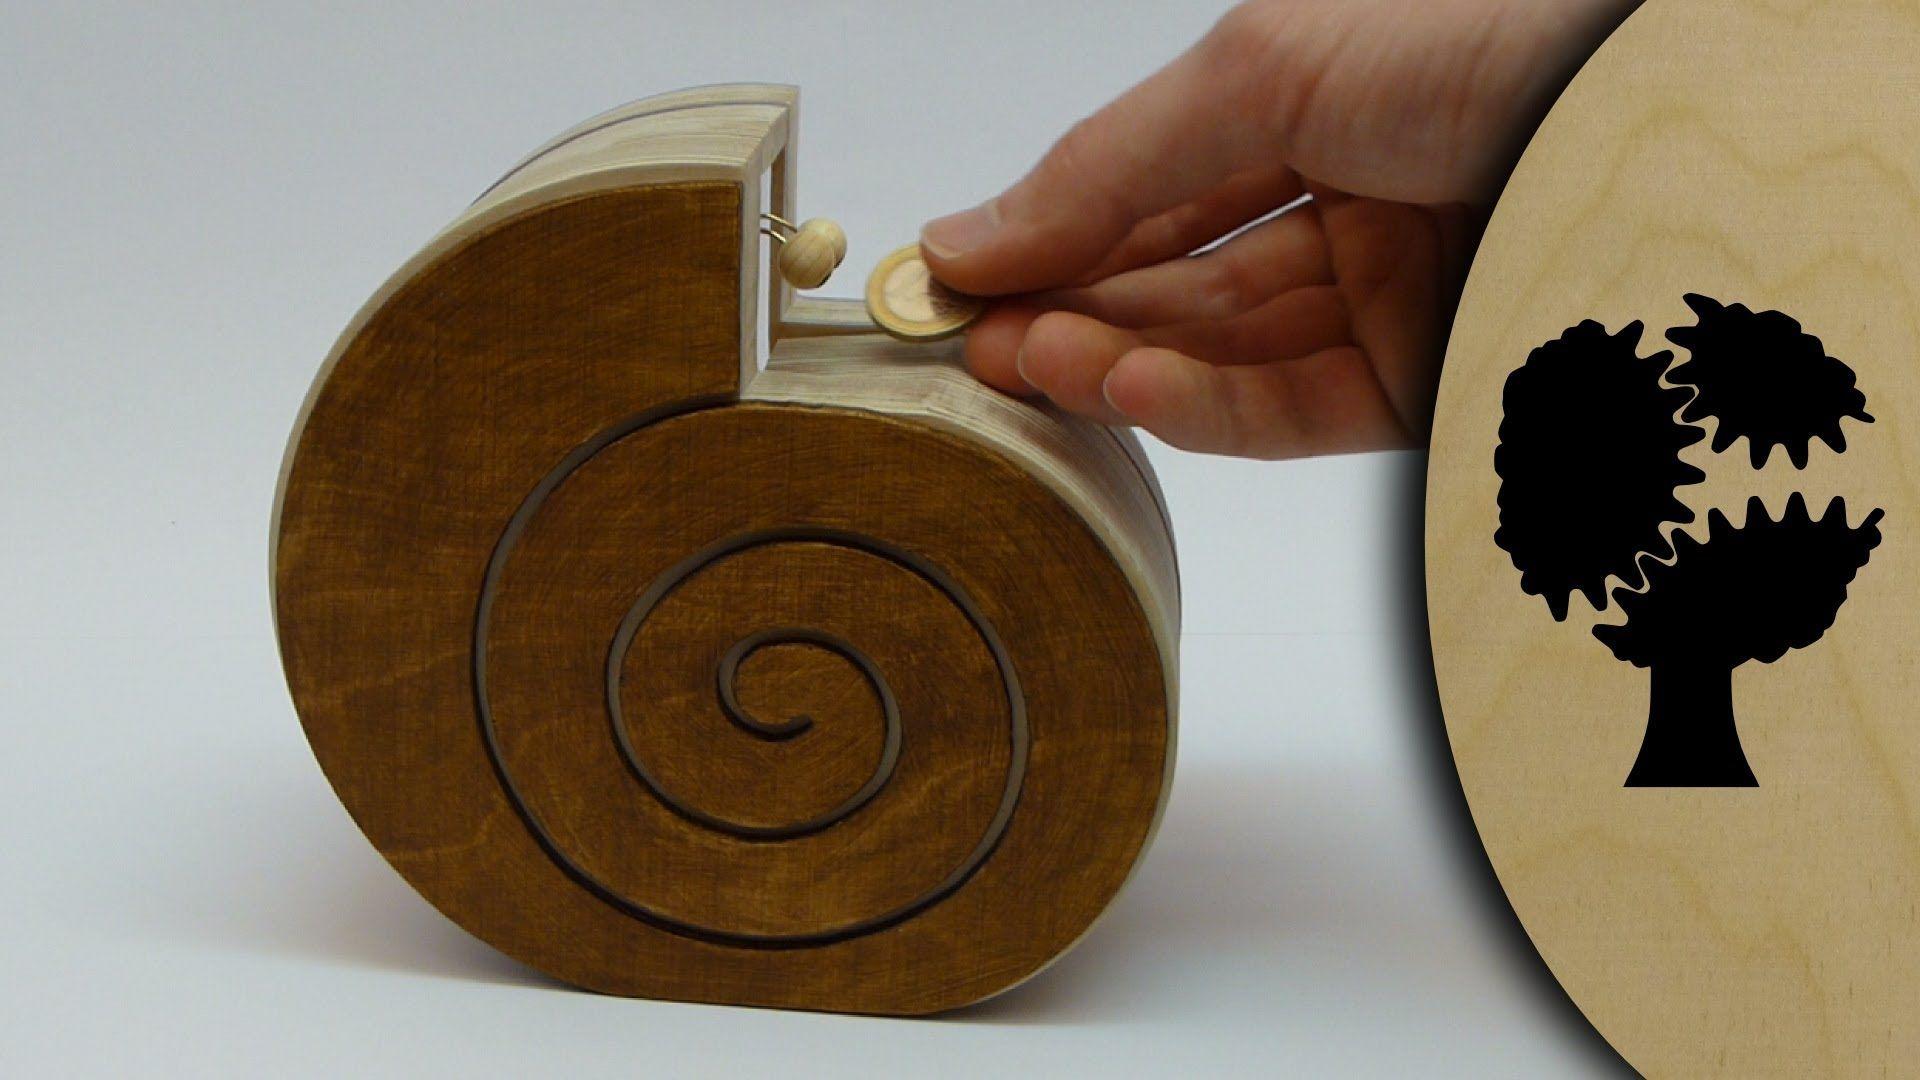 DIY Moving gears Snail Coin Bank - Video tutorial (English subtitles) #woodworking #DIYbank  https://youtu.be/WXJ6VbAGP7A Schneckchen - Holzsparkasse (Wooden Coin Bank) PDF Plans for Sale on website. #scrollsawplansandprojects http://www.holzmechanik.de